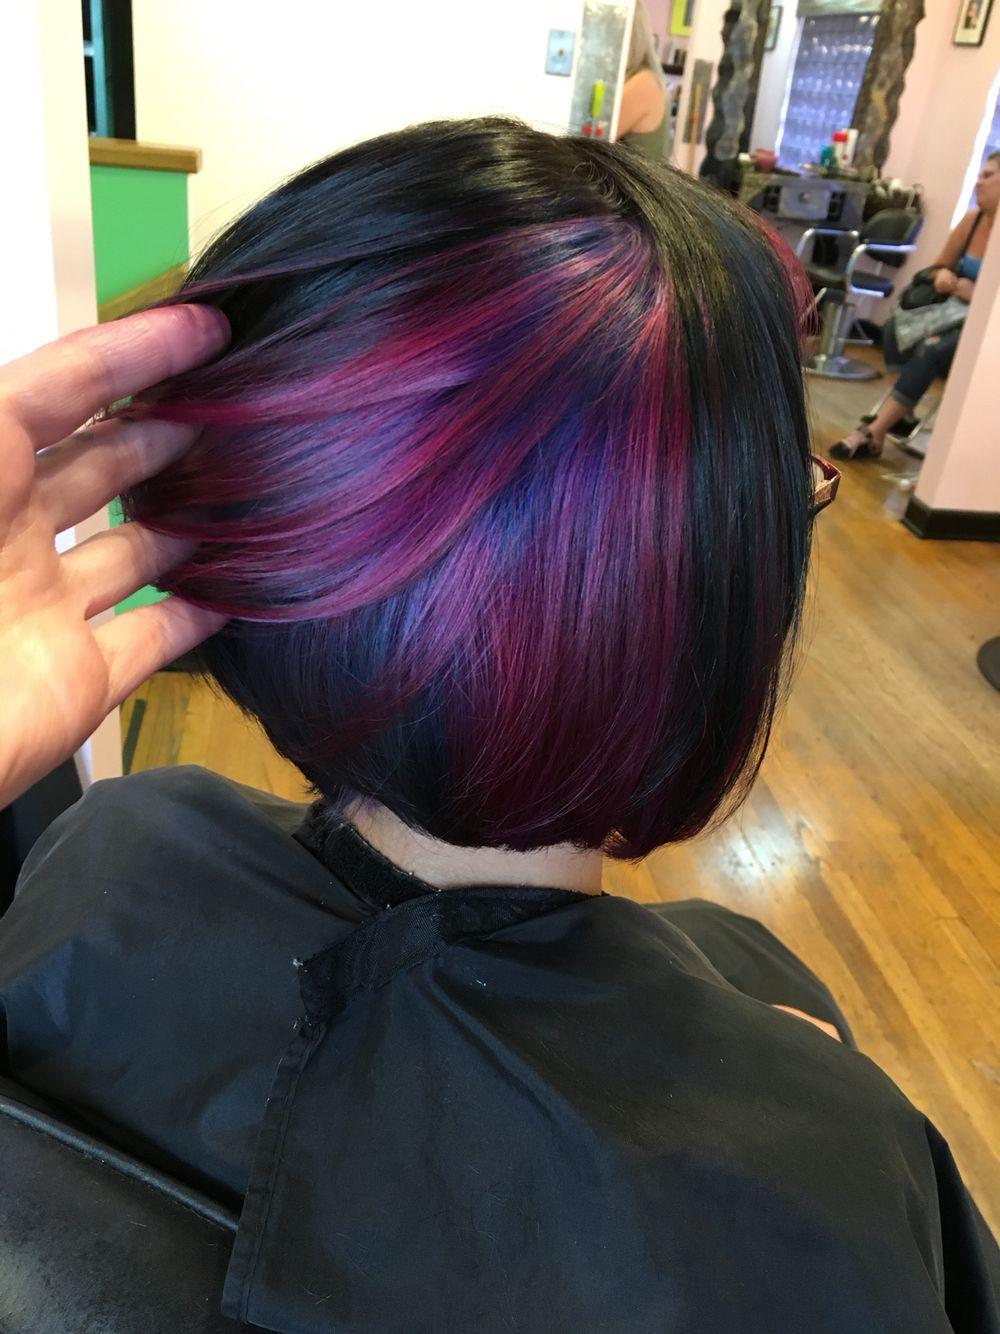 Aaashleee instagram peekaboo color purple hair pravana angled peekaboo color purple hair pravana angled bob short hair colorful hair pmusecretfo Choice Image